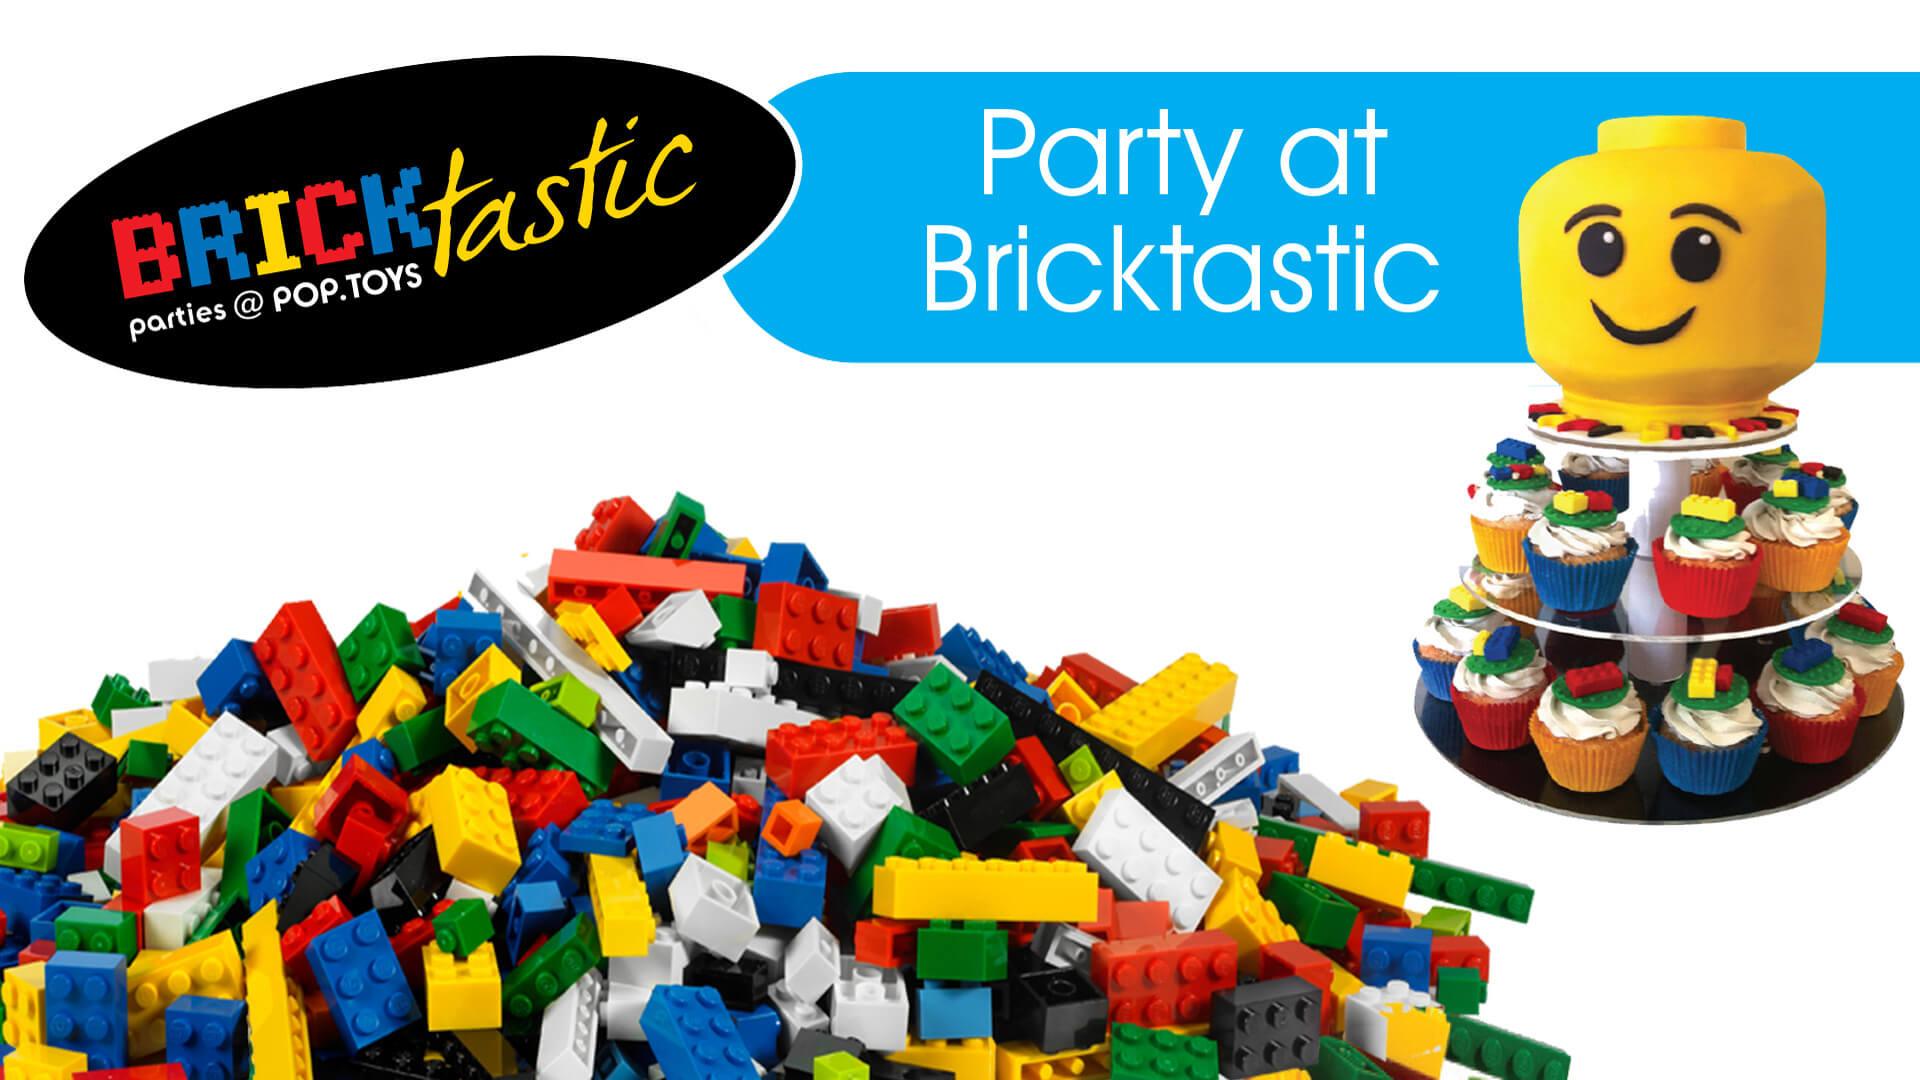 Home - image slider-brick_parties-v1 on http://pop.toys